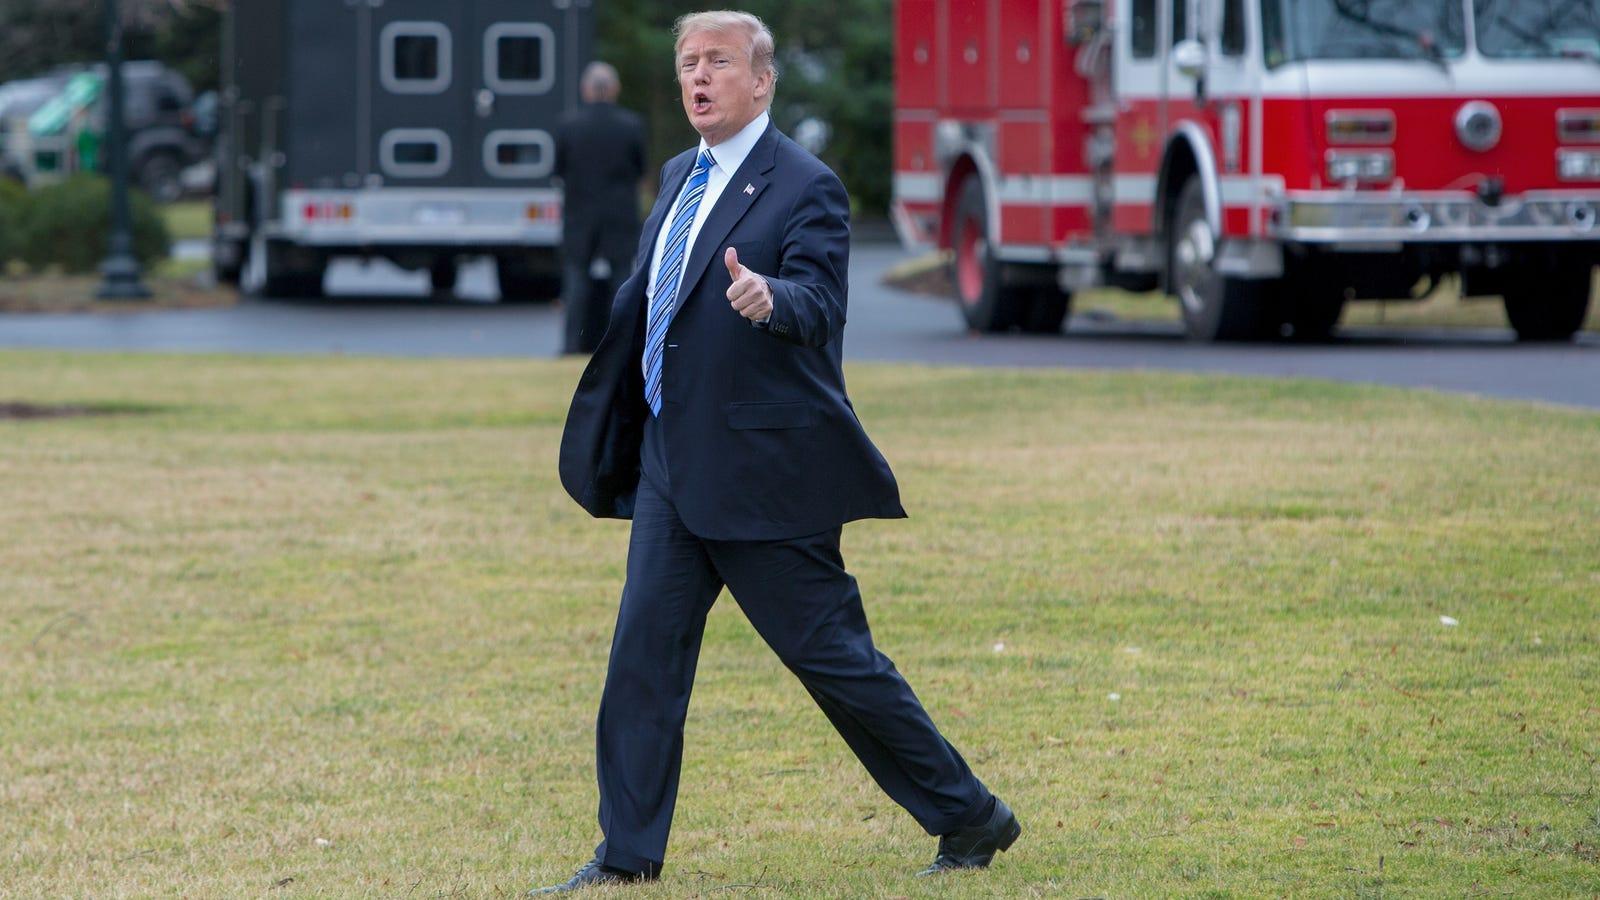 hlkirhrvfiiolihzdxqz - Trump Now Asking His Billionaire Mar-a-Lago Buddies If He Should Do Something About Gun Control